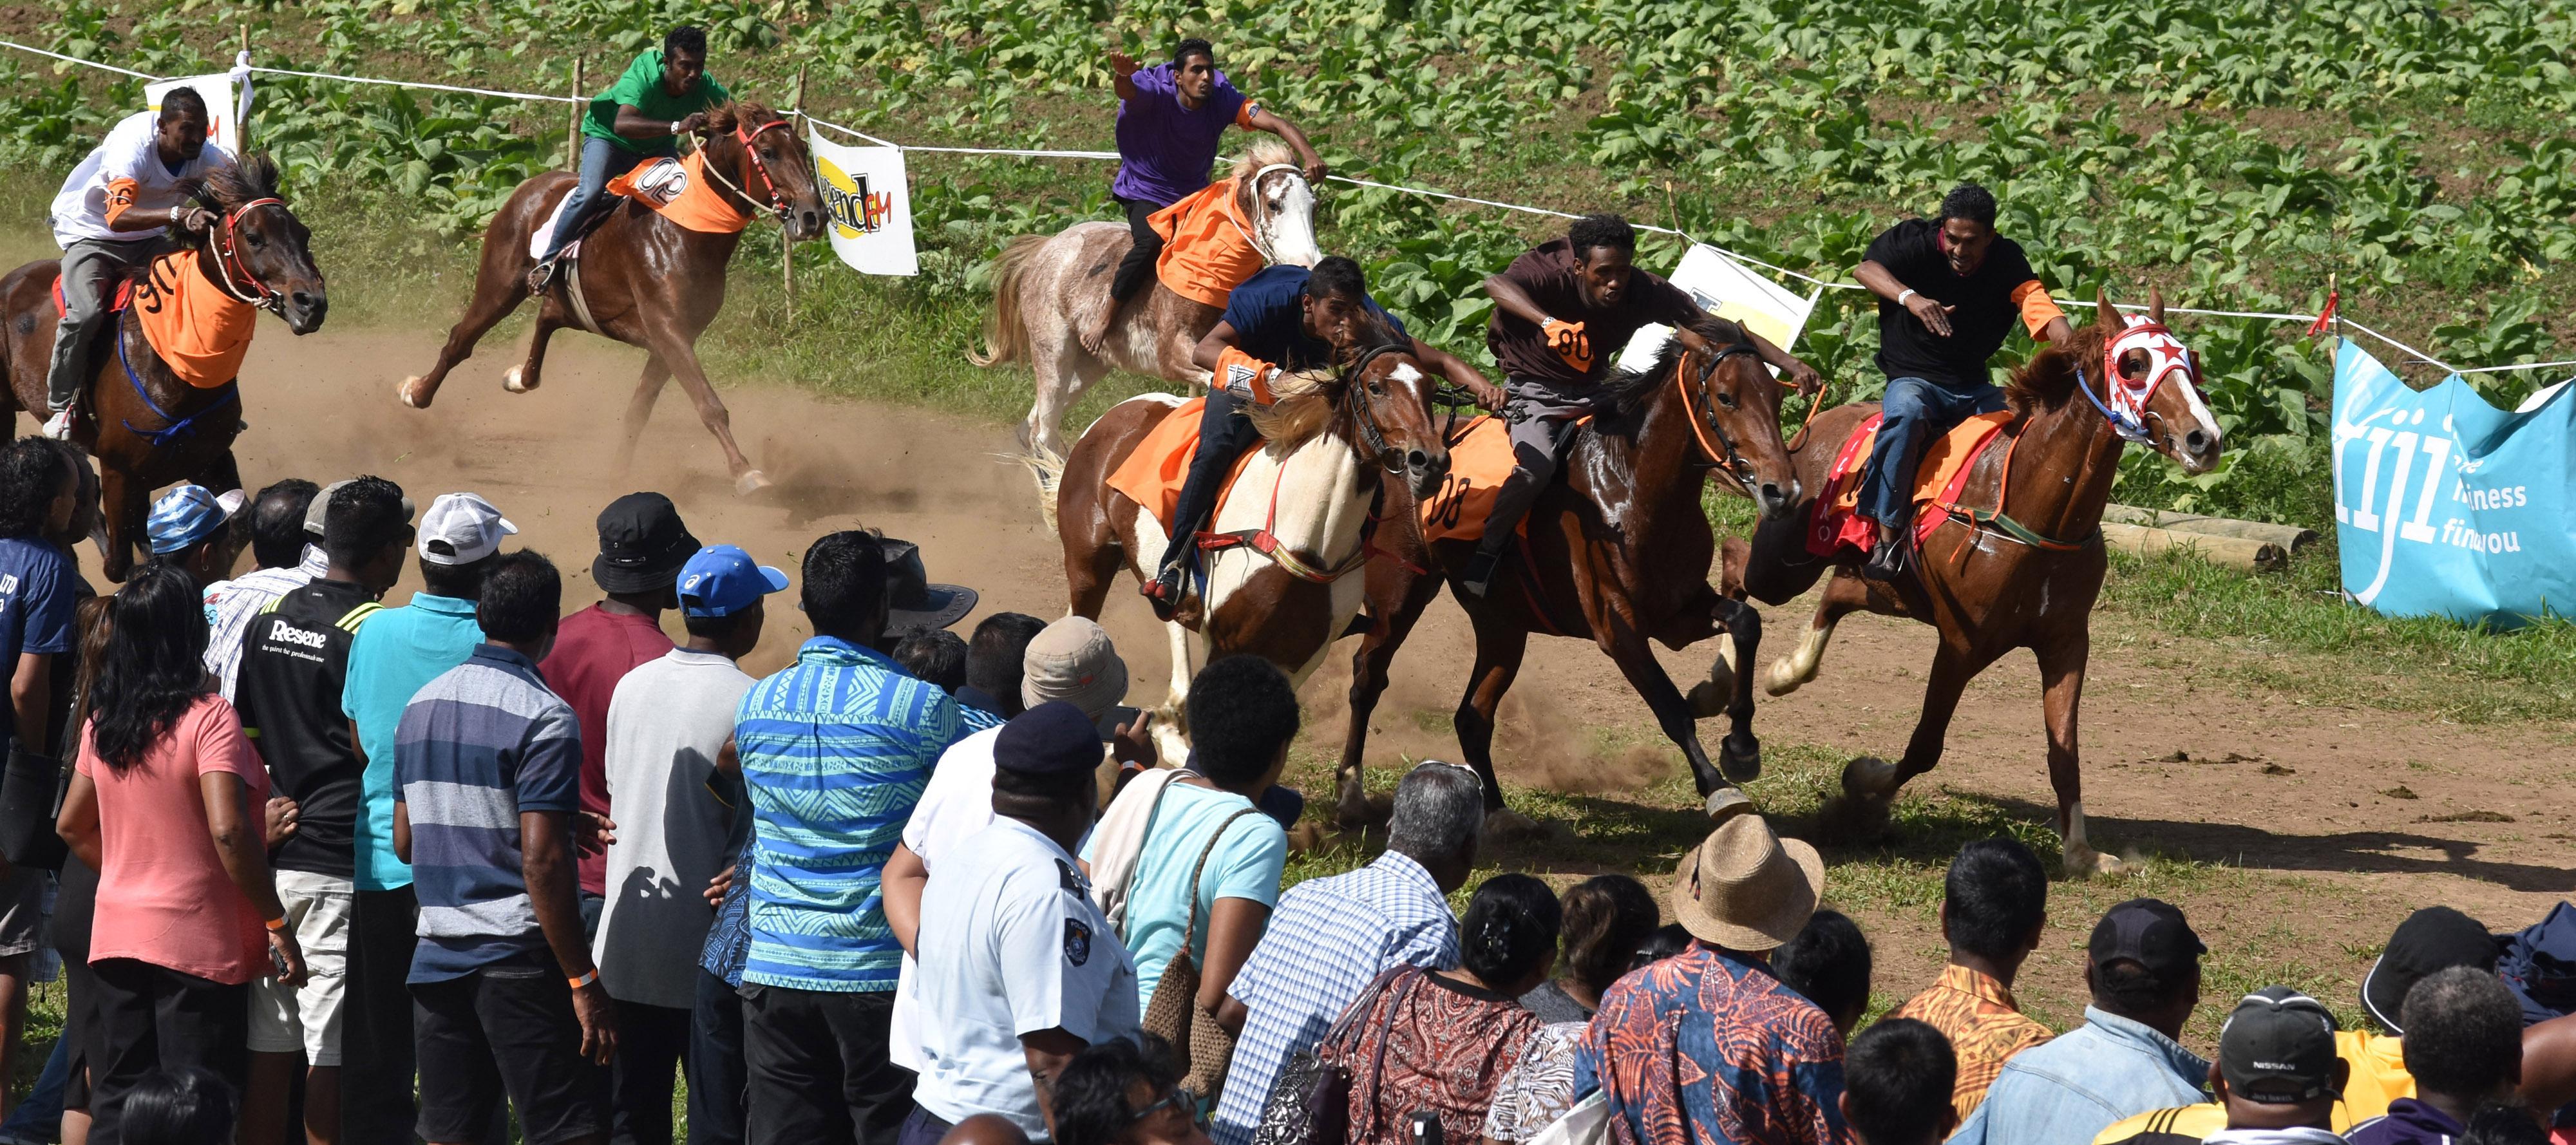 Volcano wins the race at the Sabeto Races at Aviva Farms in Sabeto, Nadi on June 30, 2018.  Photo: Waisea Nsokia